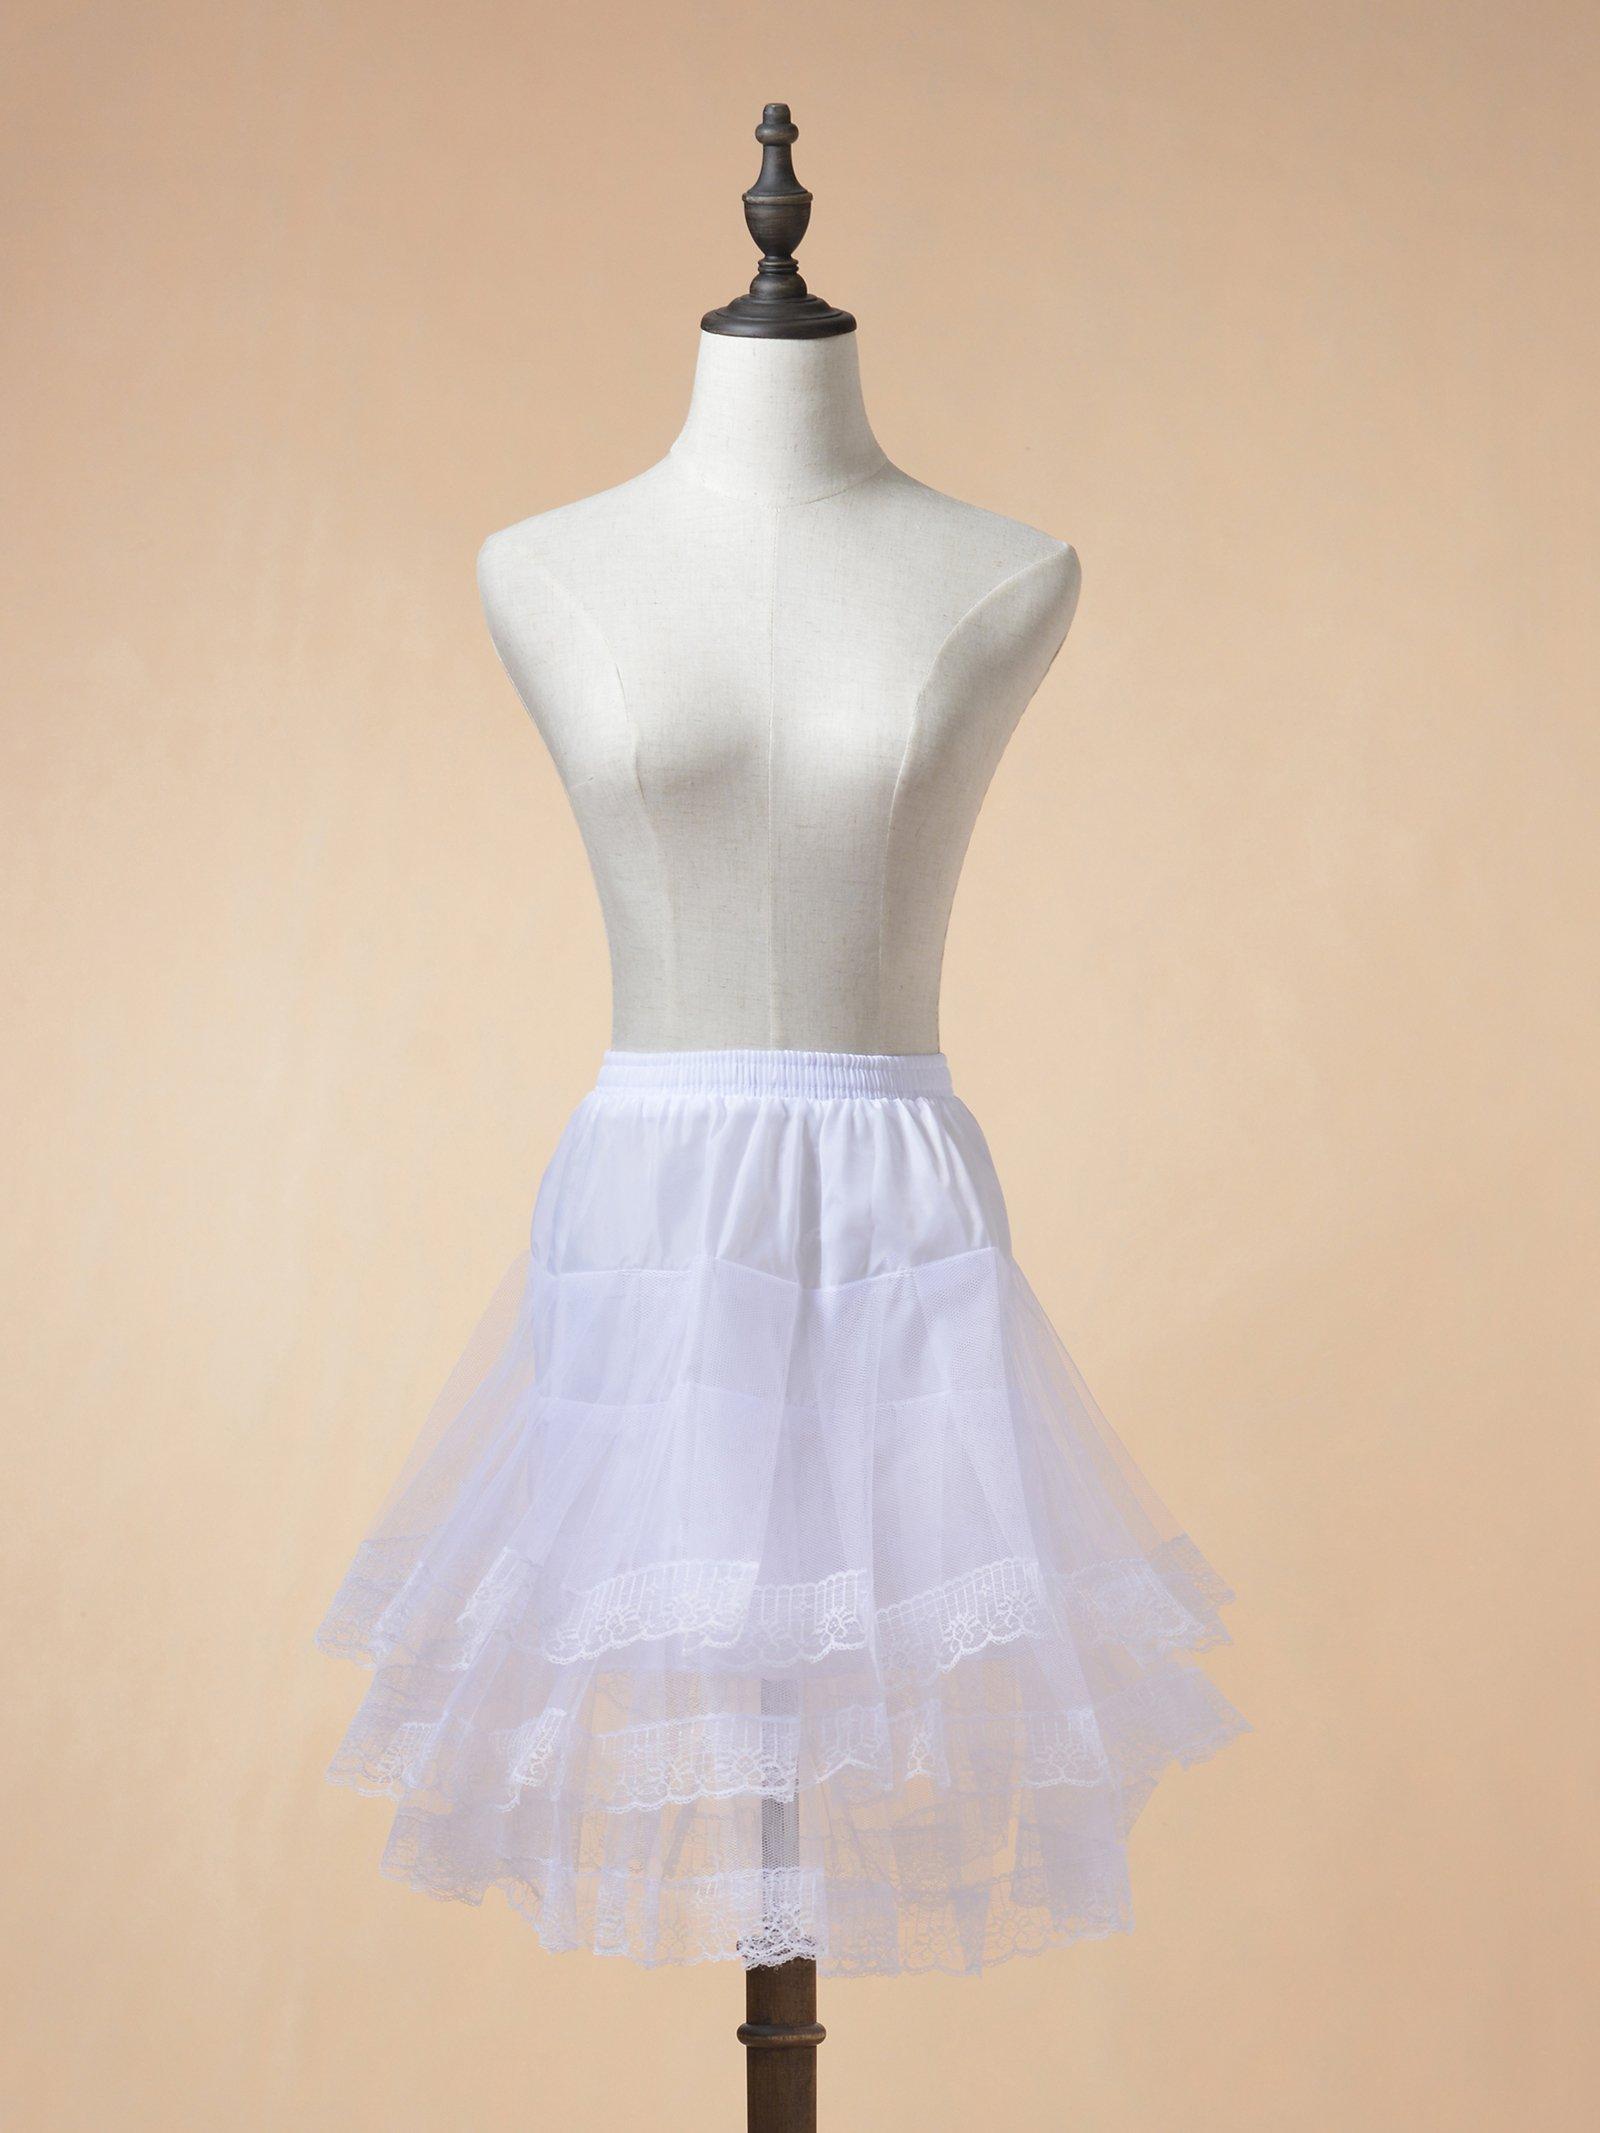 Remedios Kids Mini White Petticoat Flower Girl Wedding Underskirt Cocktail Dress Crinoline Slip White by Remedios (Image #2)